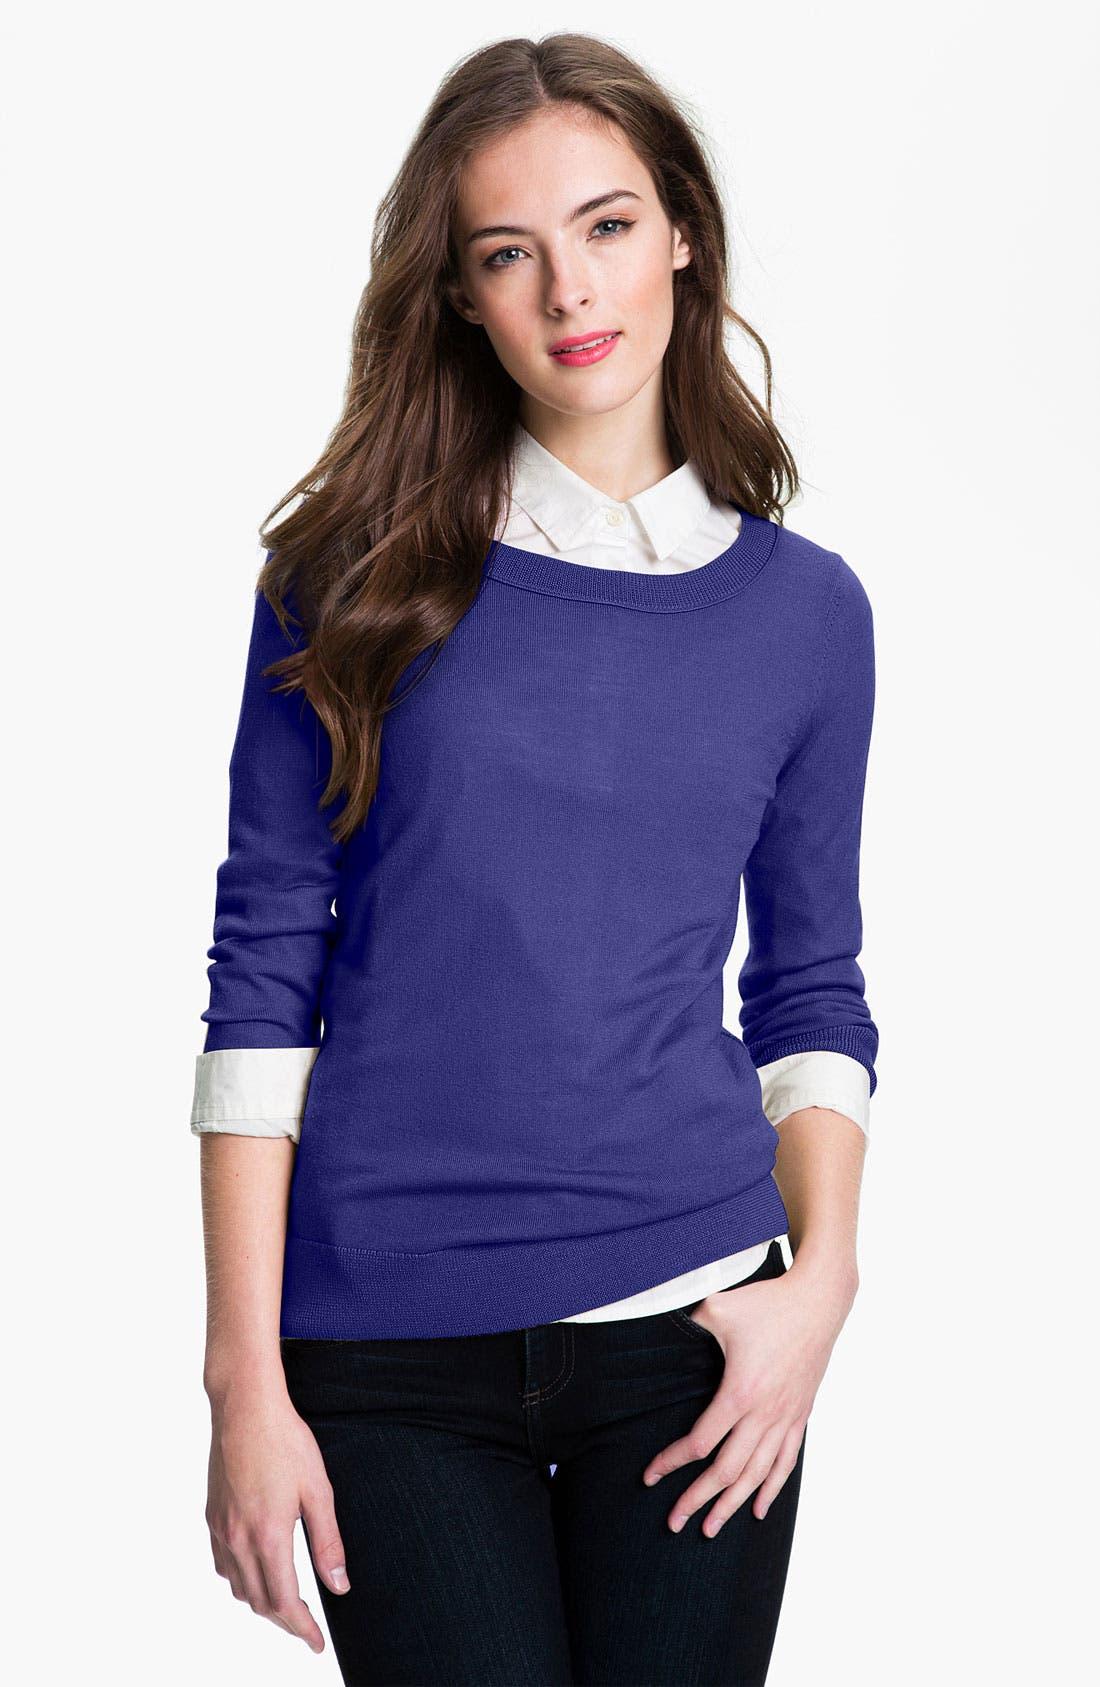 Alternate Image 1 Selected - Halogen® Merino Crewneck Sweater (Petite)